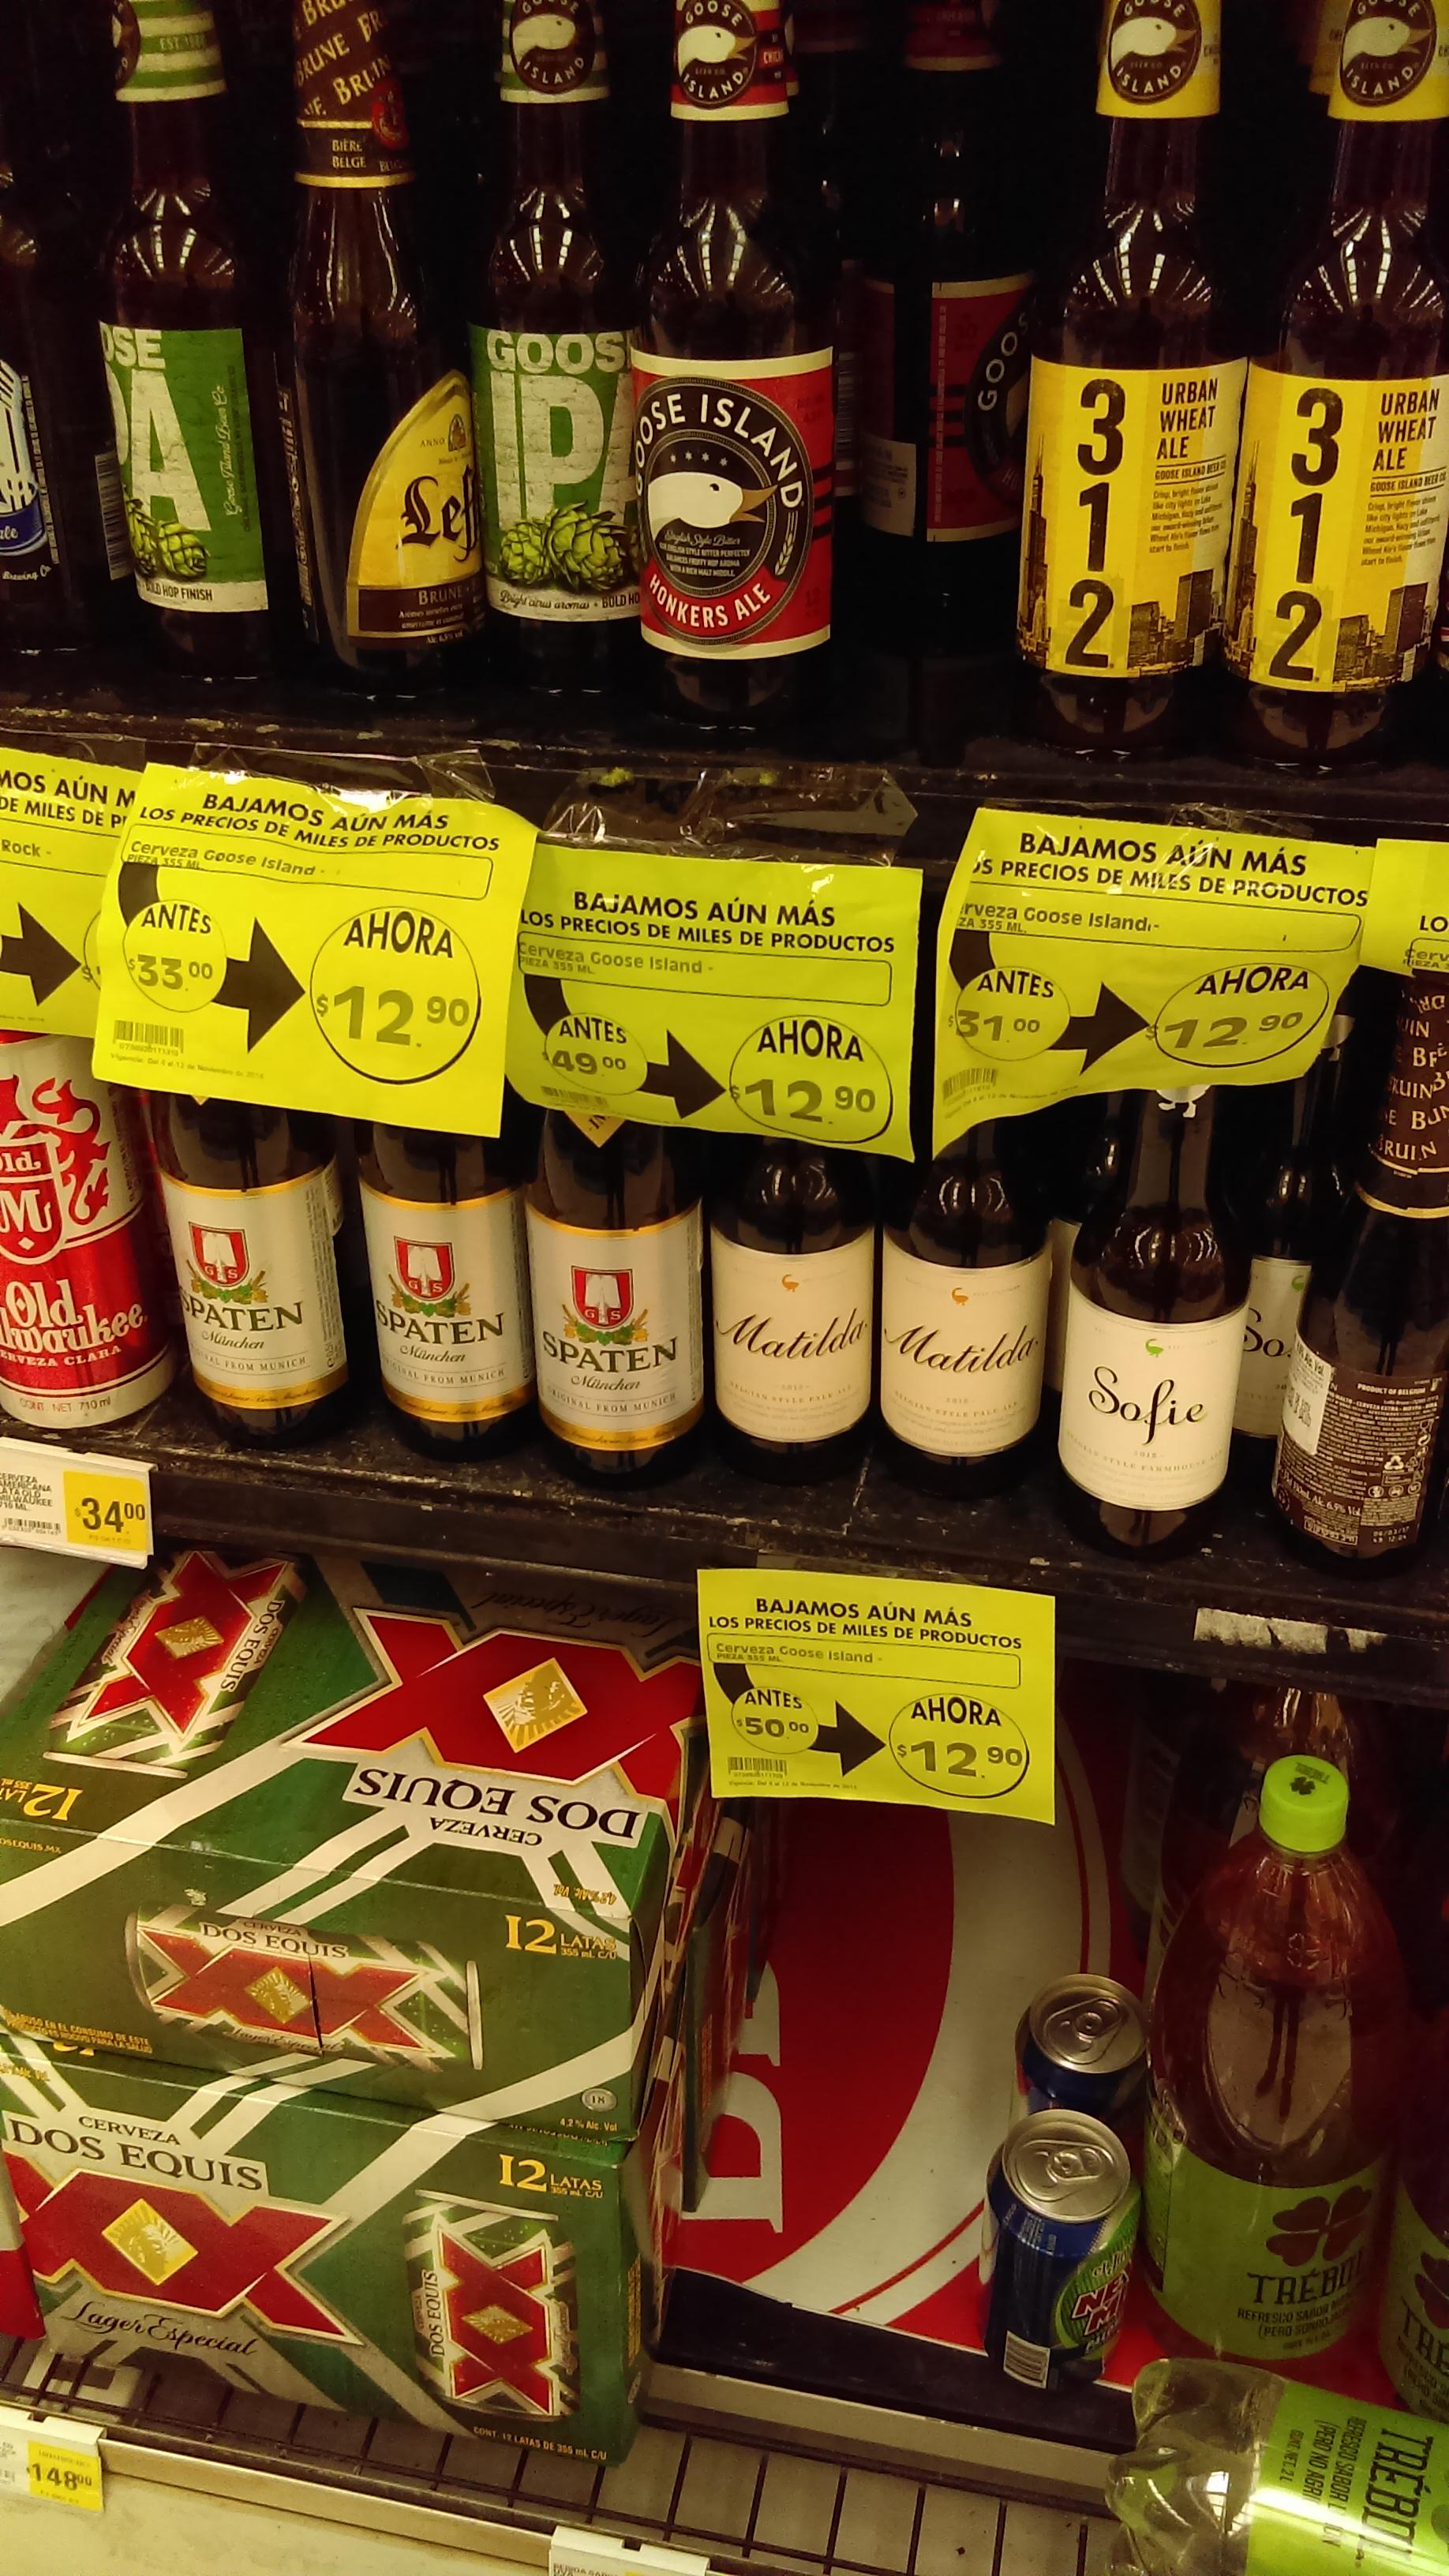 Mega Comercial Boca del rio: Cervezas Importadas desde $50 a 12.90 (+ 1 oferta)